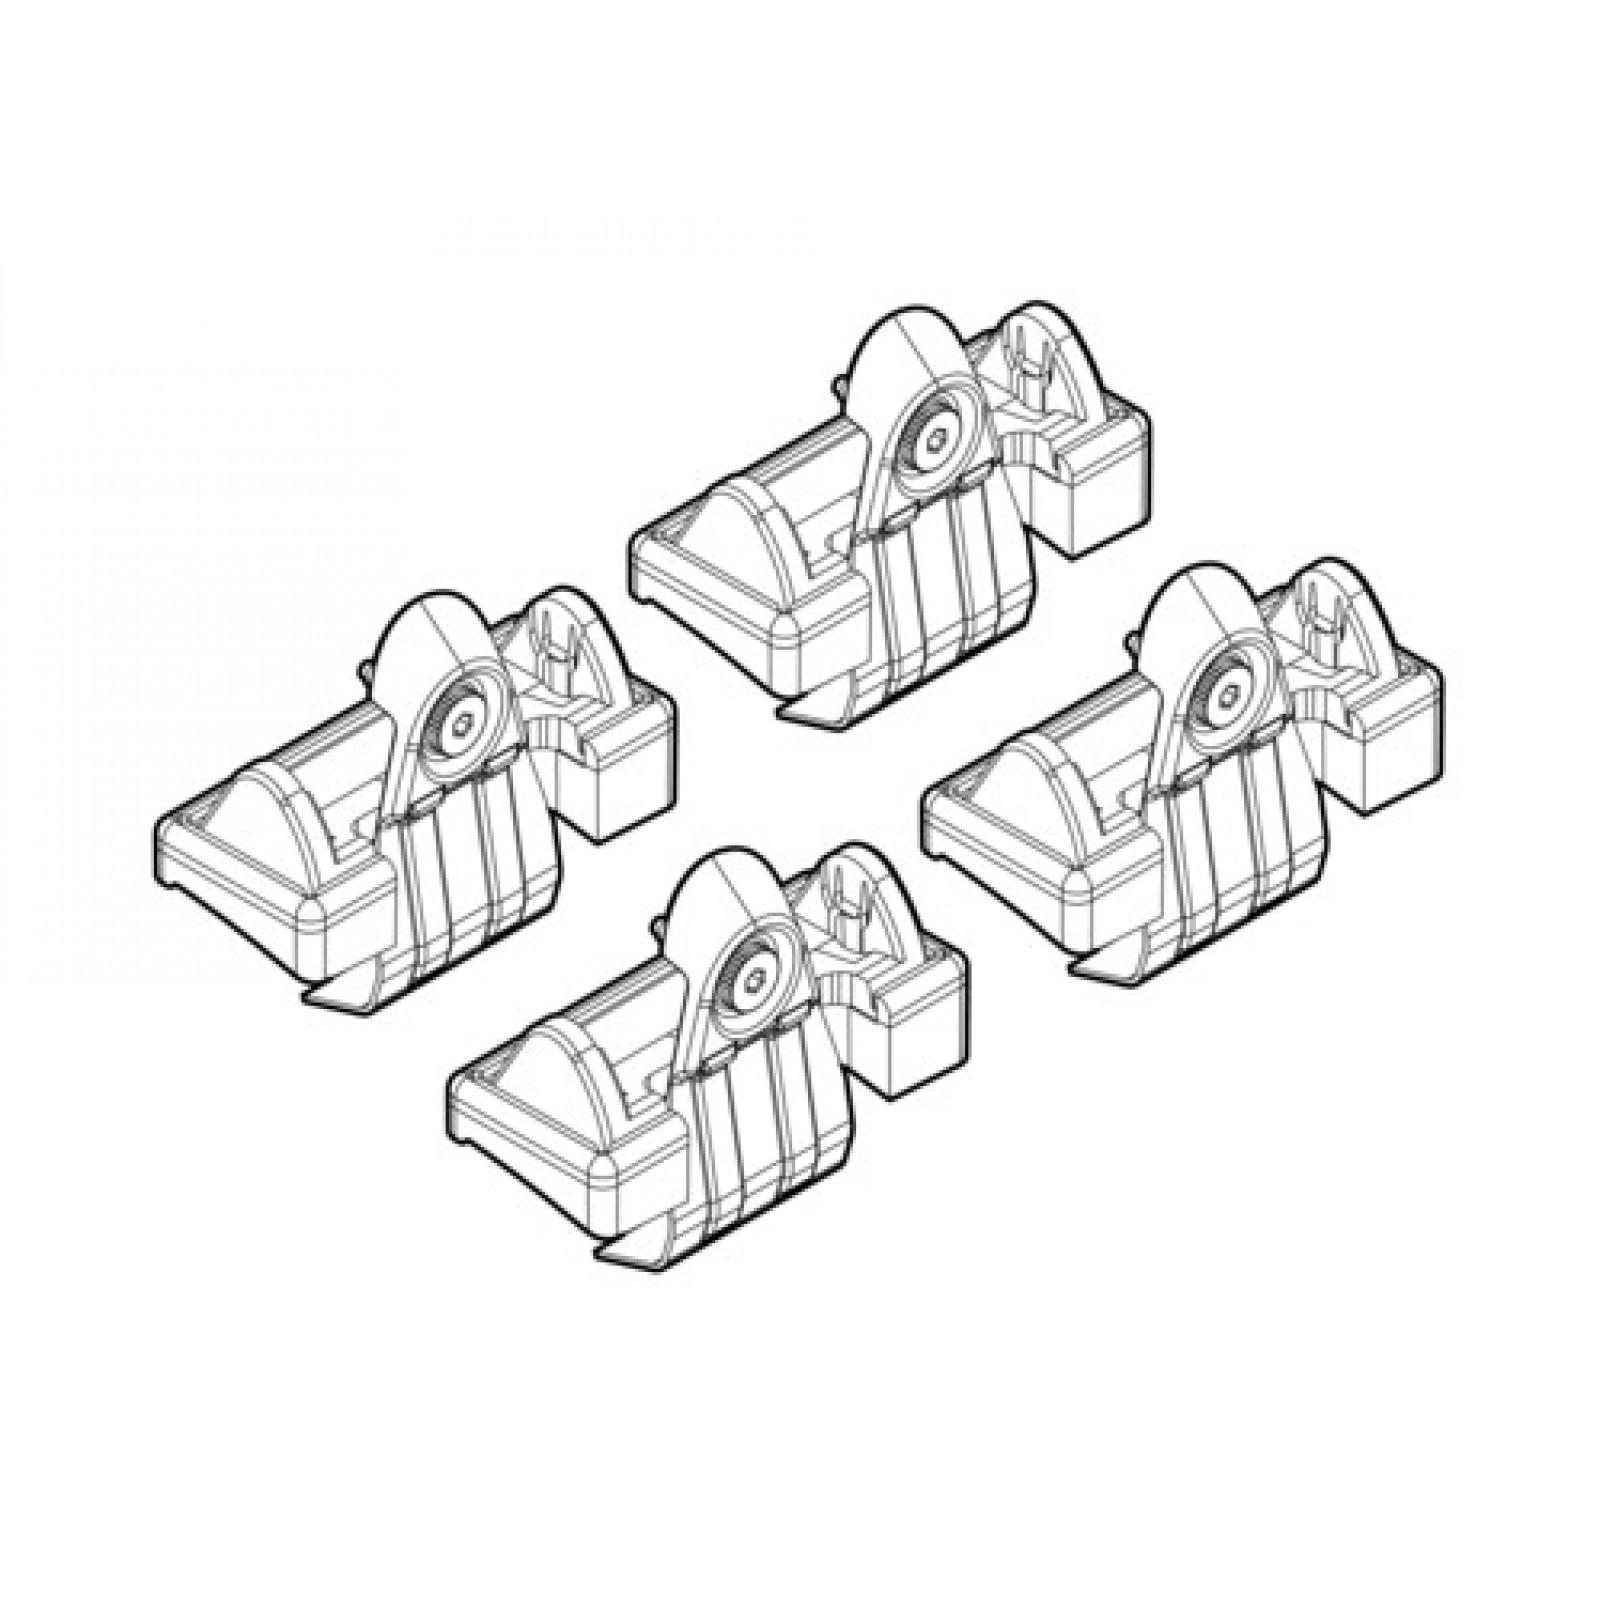 barres de toit pour volkswagen golf vi 5 portes. Black Bedroom Furniture Sets. Home Design Ideas